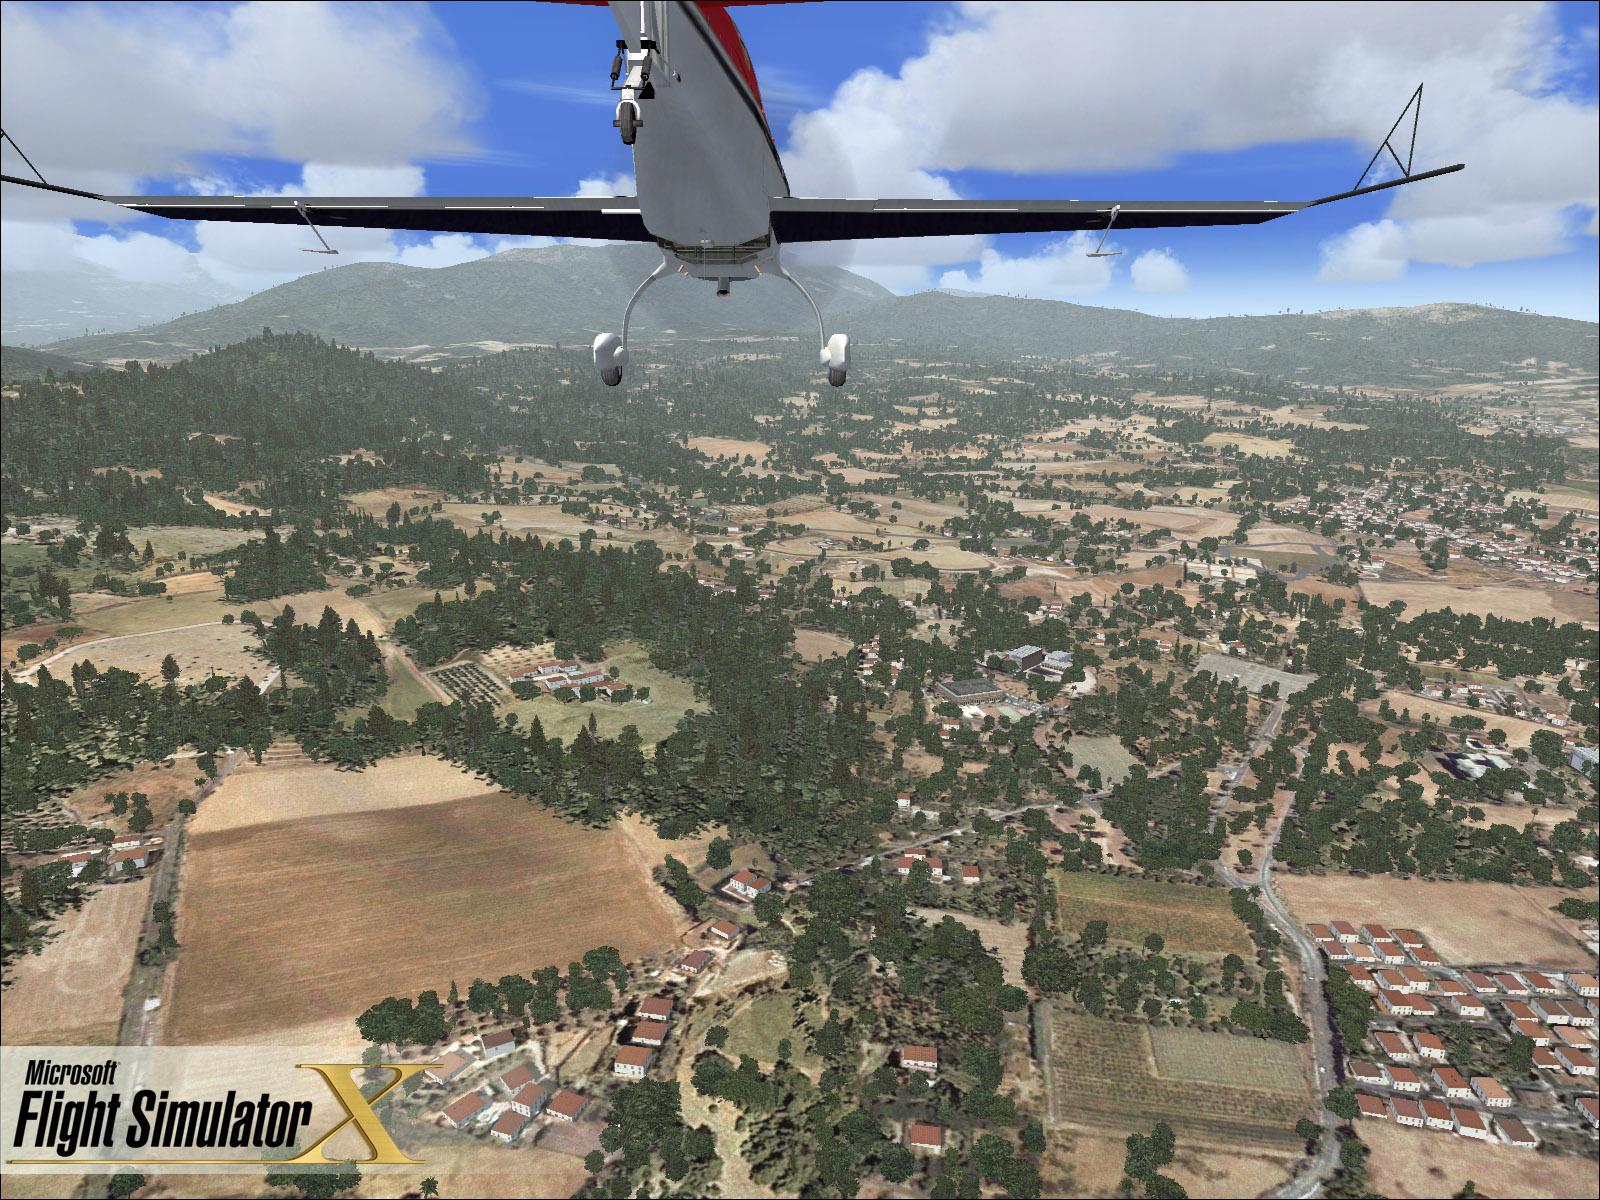 Скриншоты из игры Microsoft Flight Simulator X.